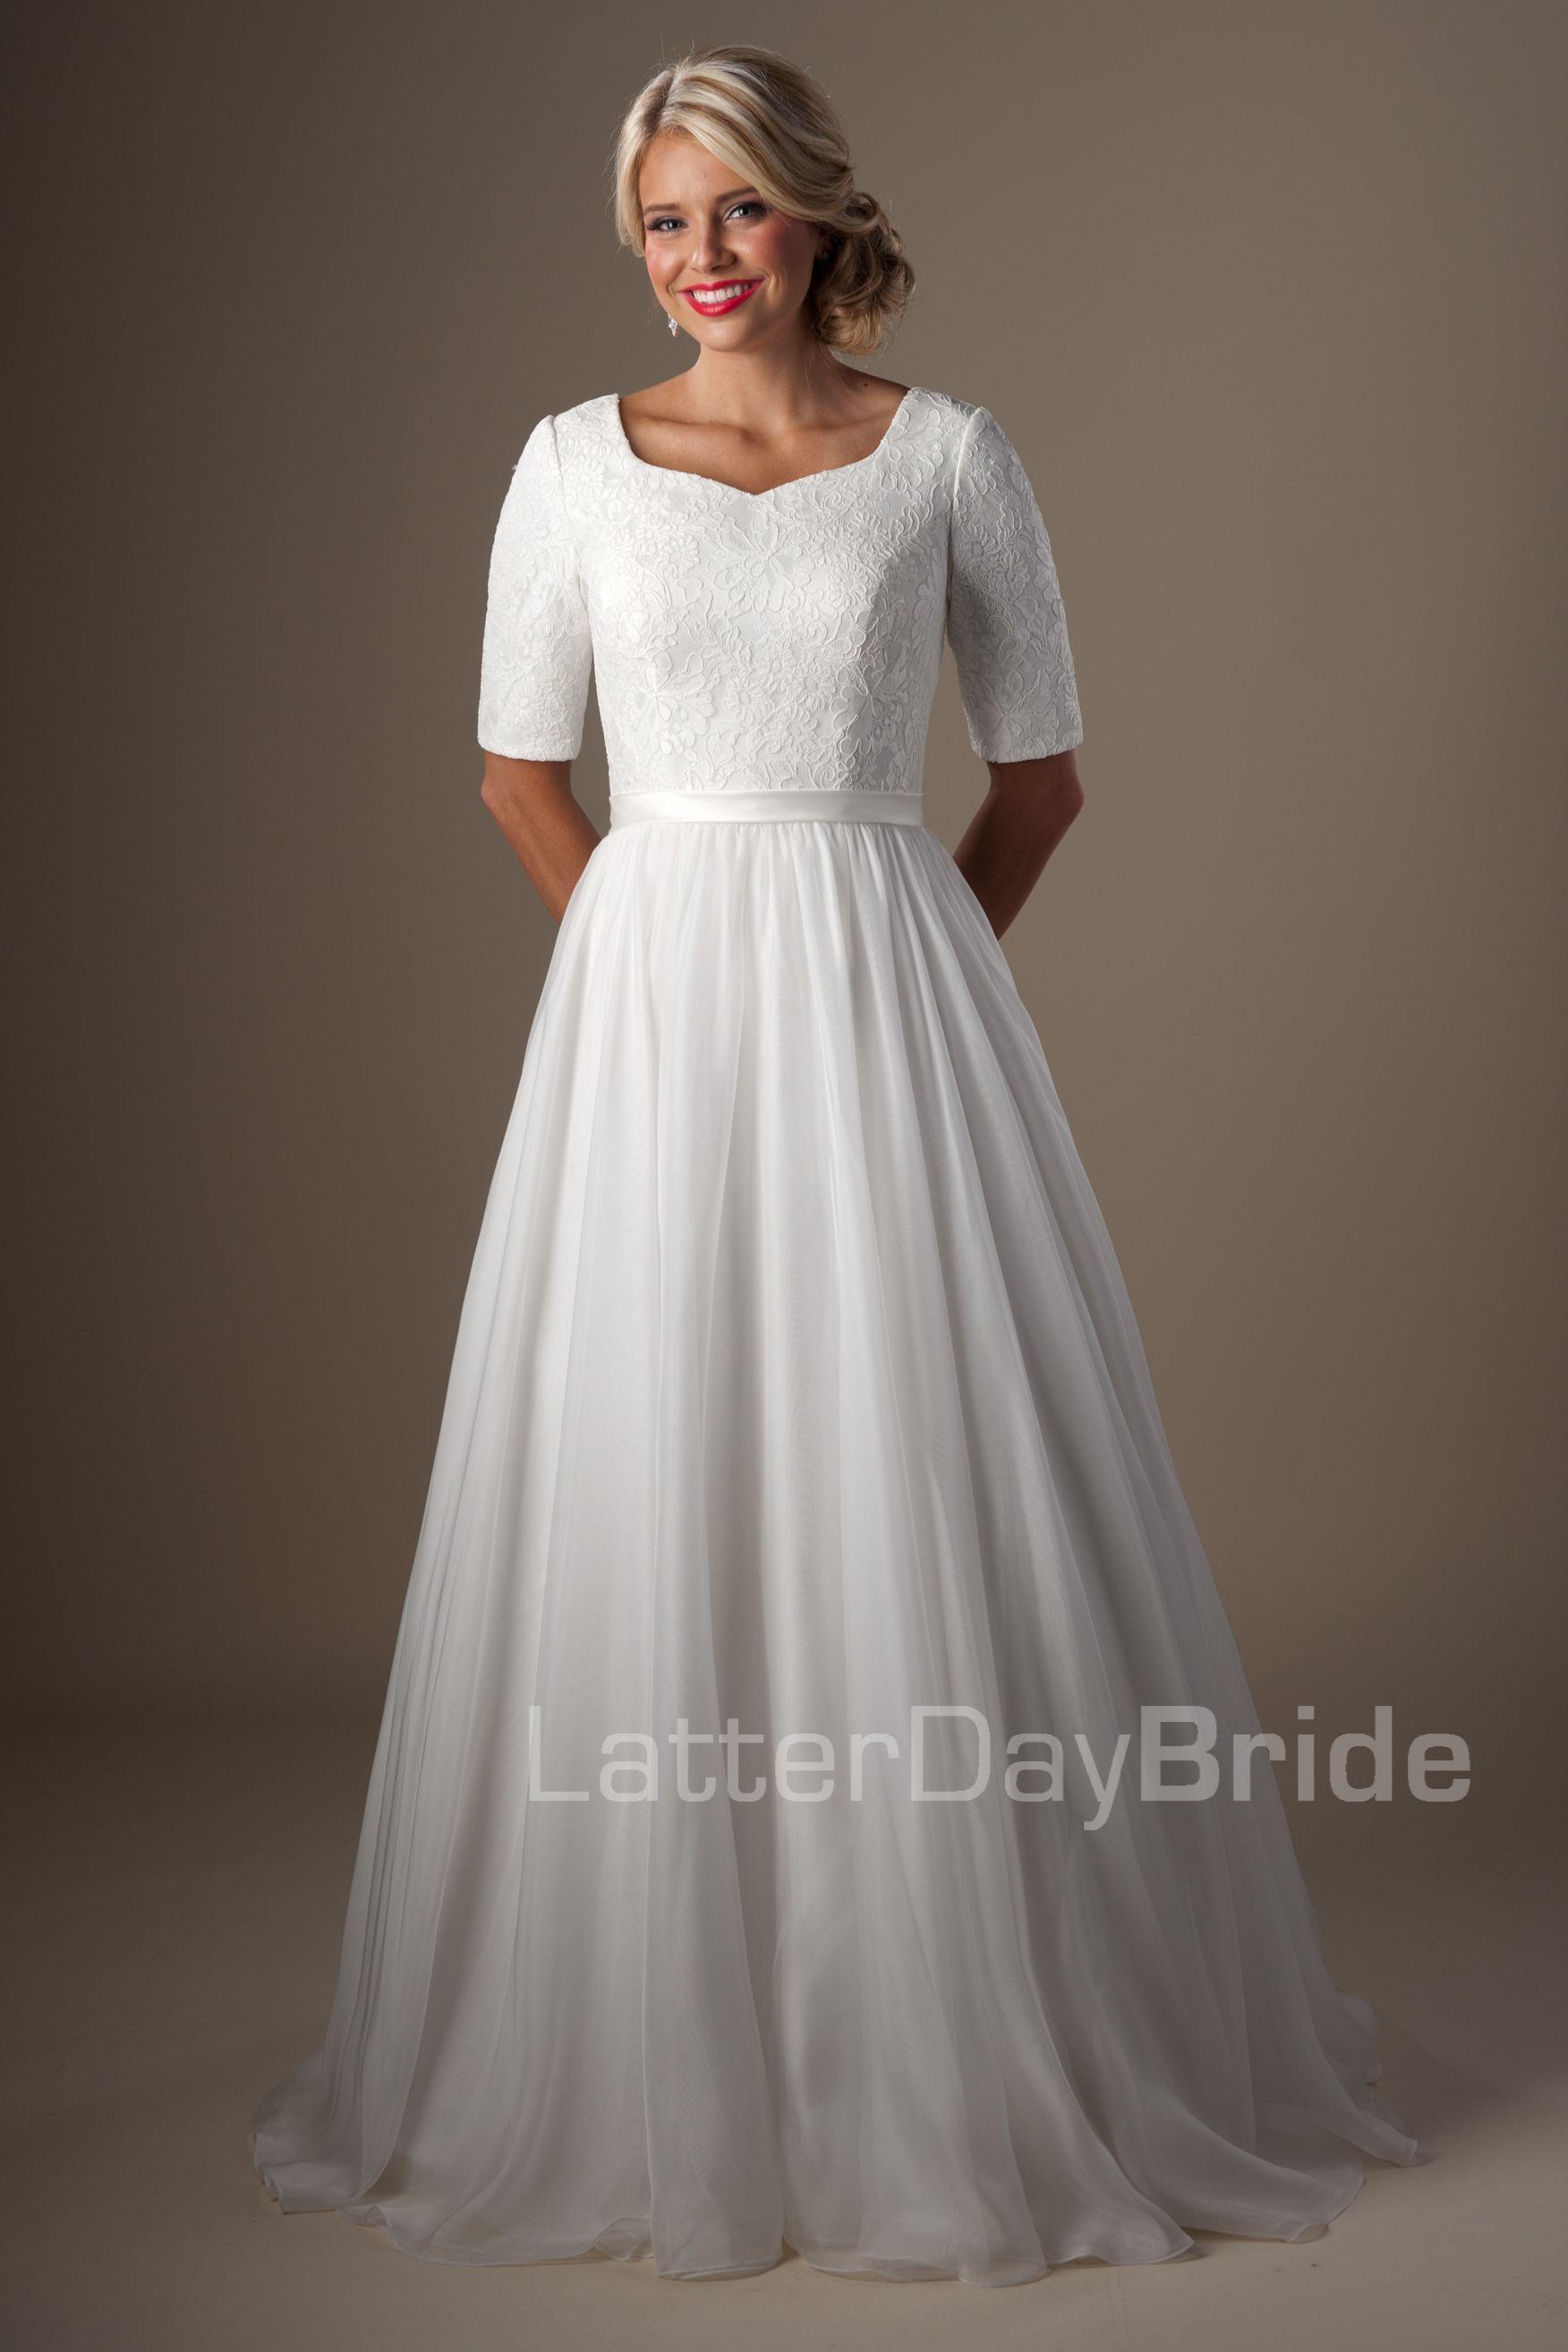 Discount Vintage Lace Chiffon Half Sleeves Modest Wedding